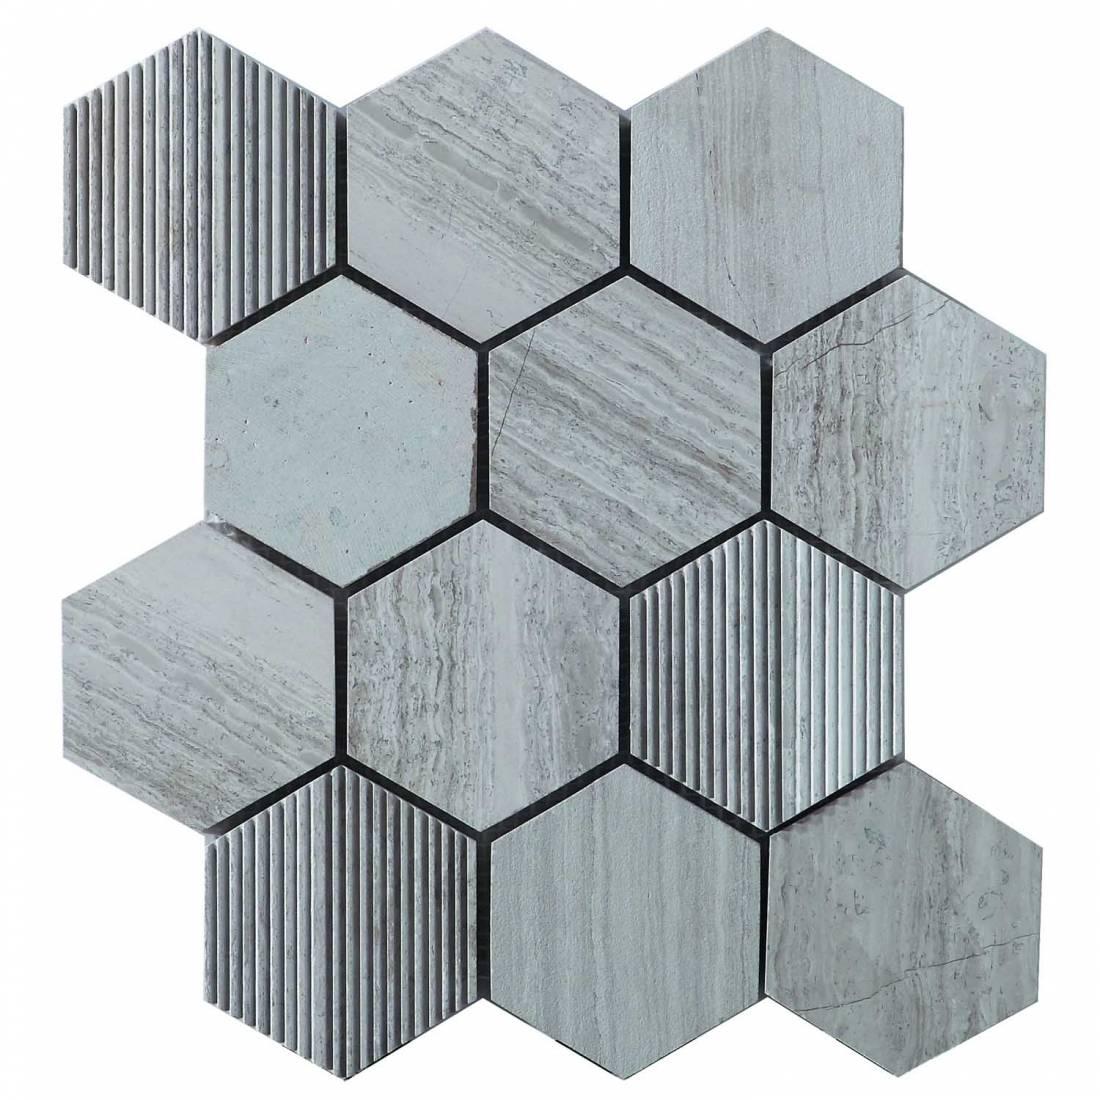 Hex Mosaic Texture 23.1x26.7 White Matt 1